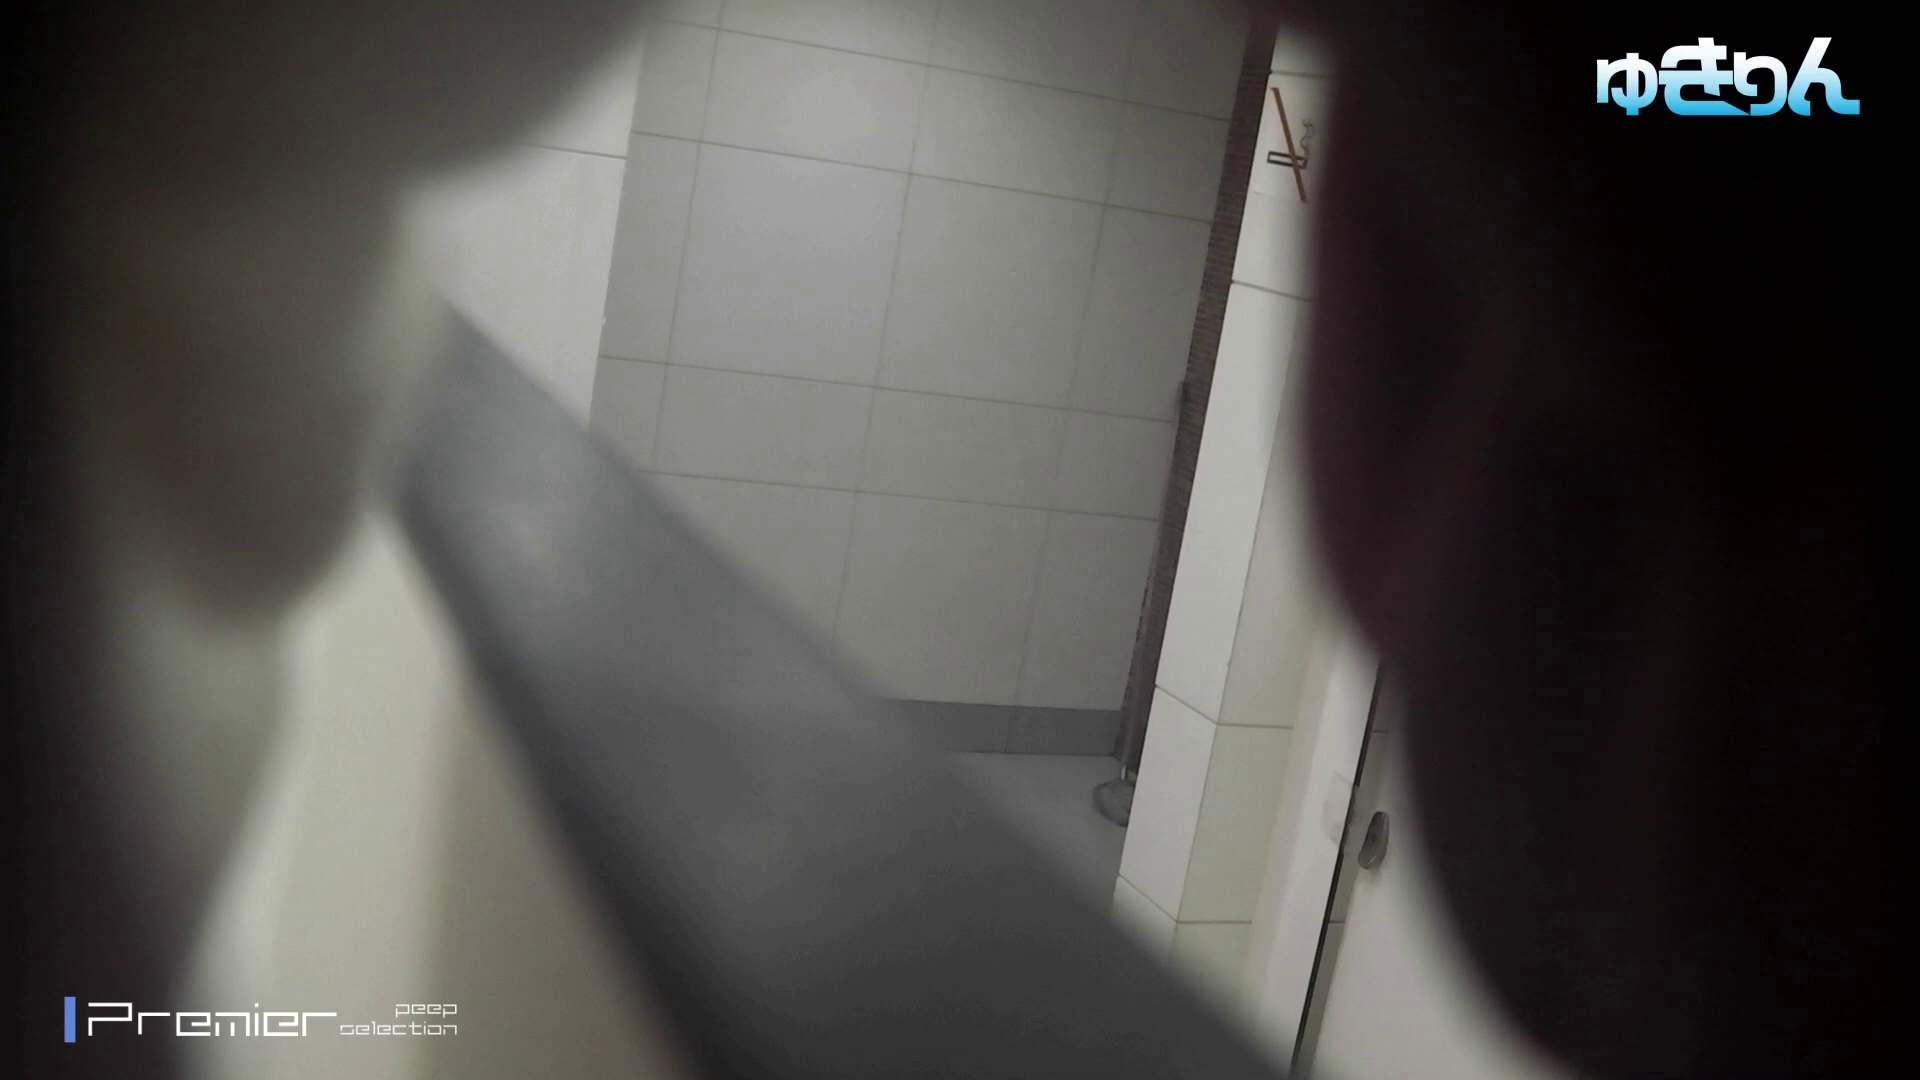 cm友達同士三人グループの二人を同時に捕獲【新世界の射窓からNo120】 高評価 オマンコ無修正動画無料 80枚 19